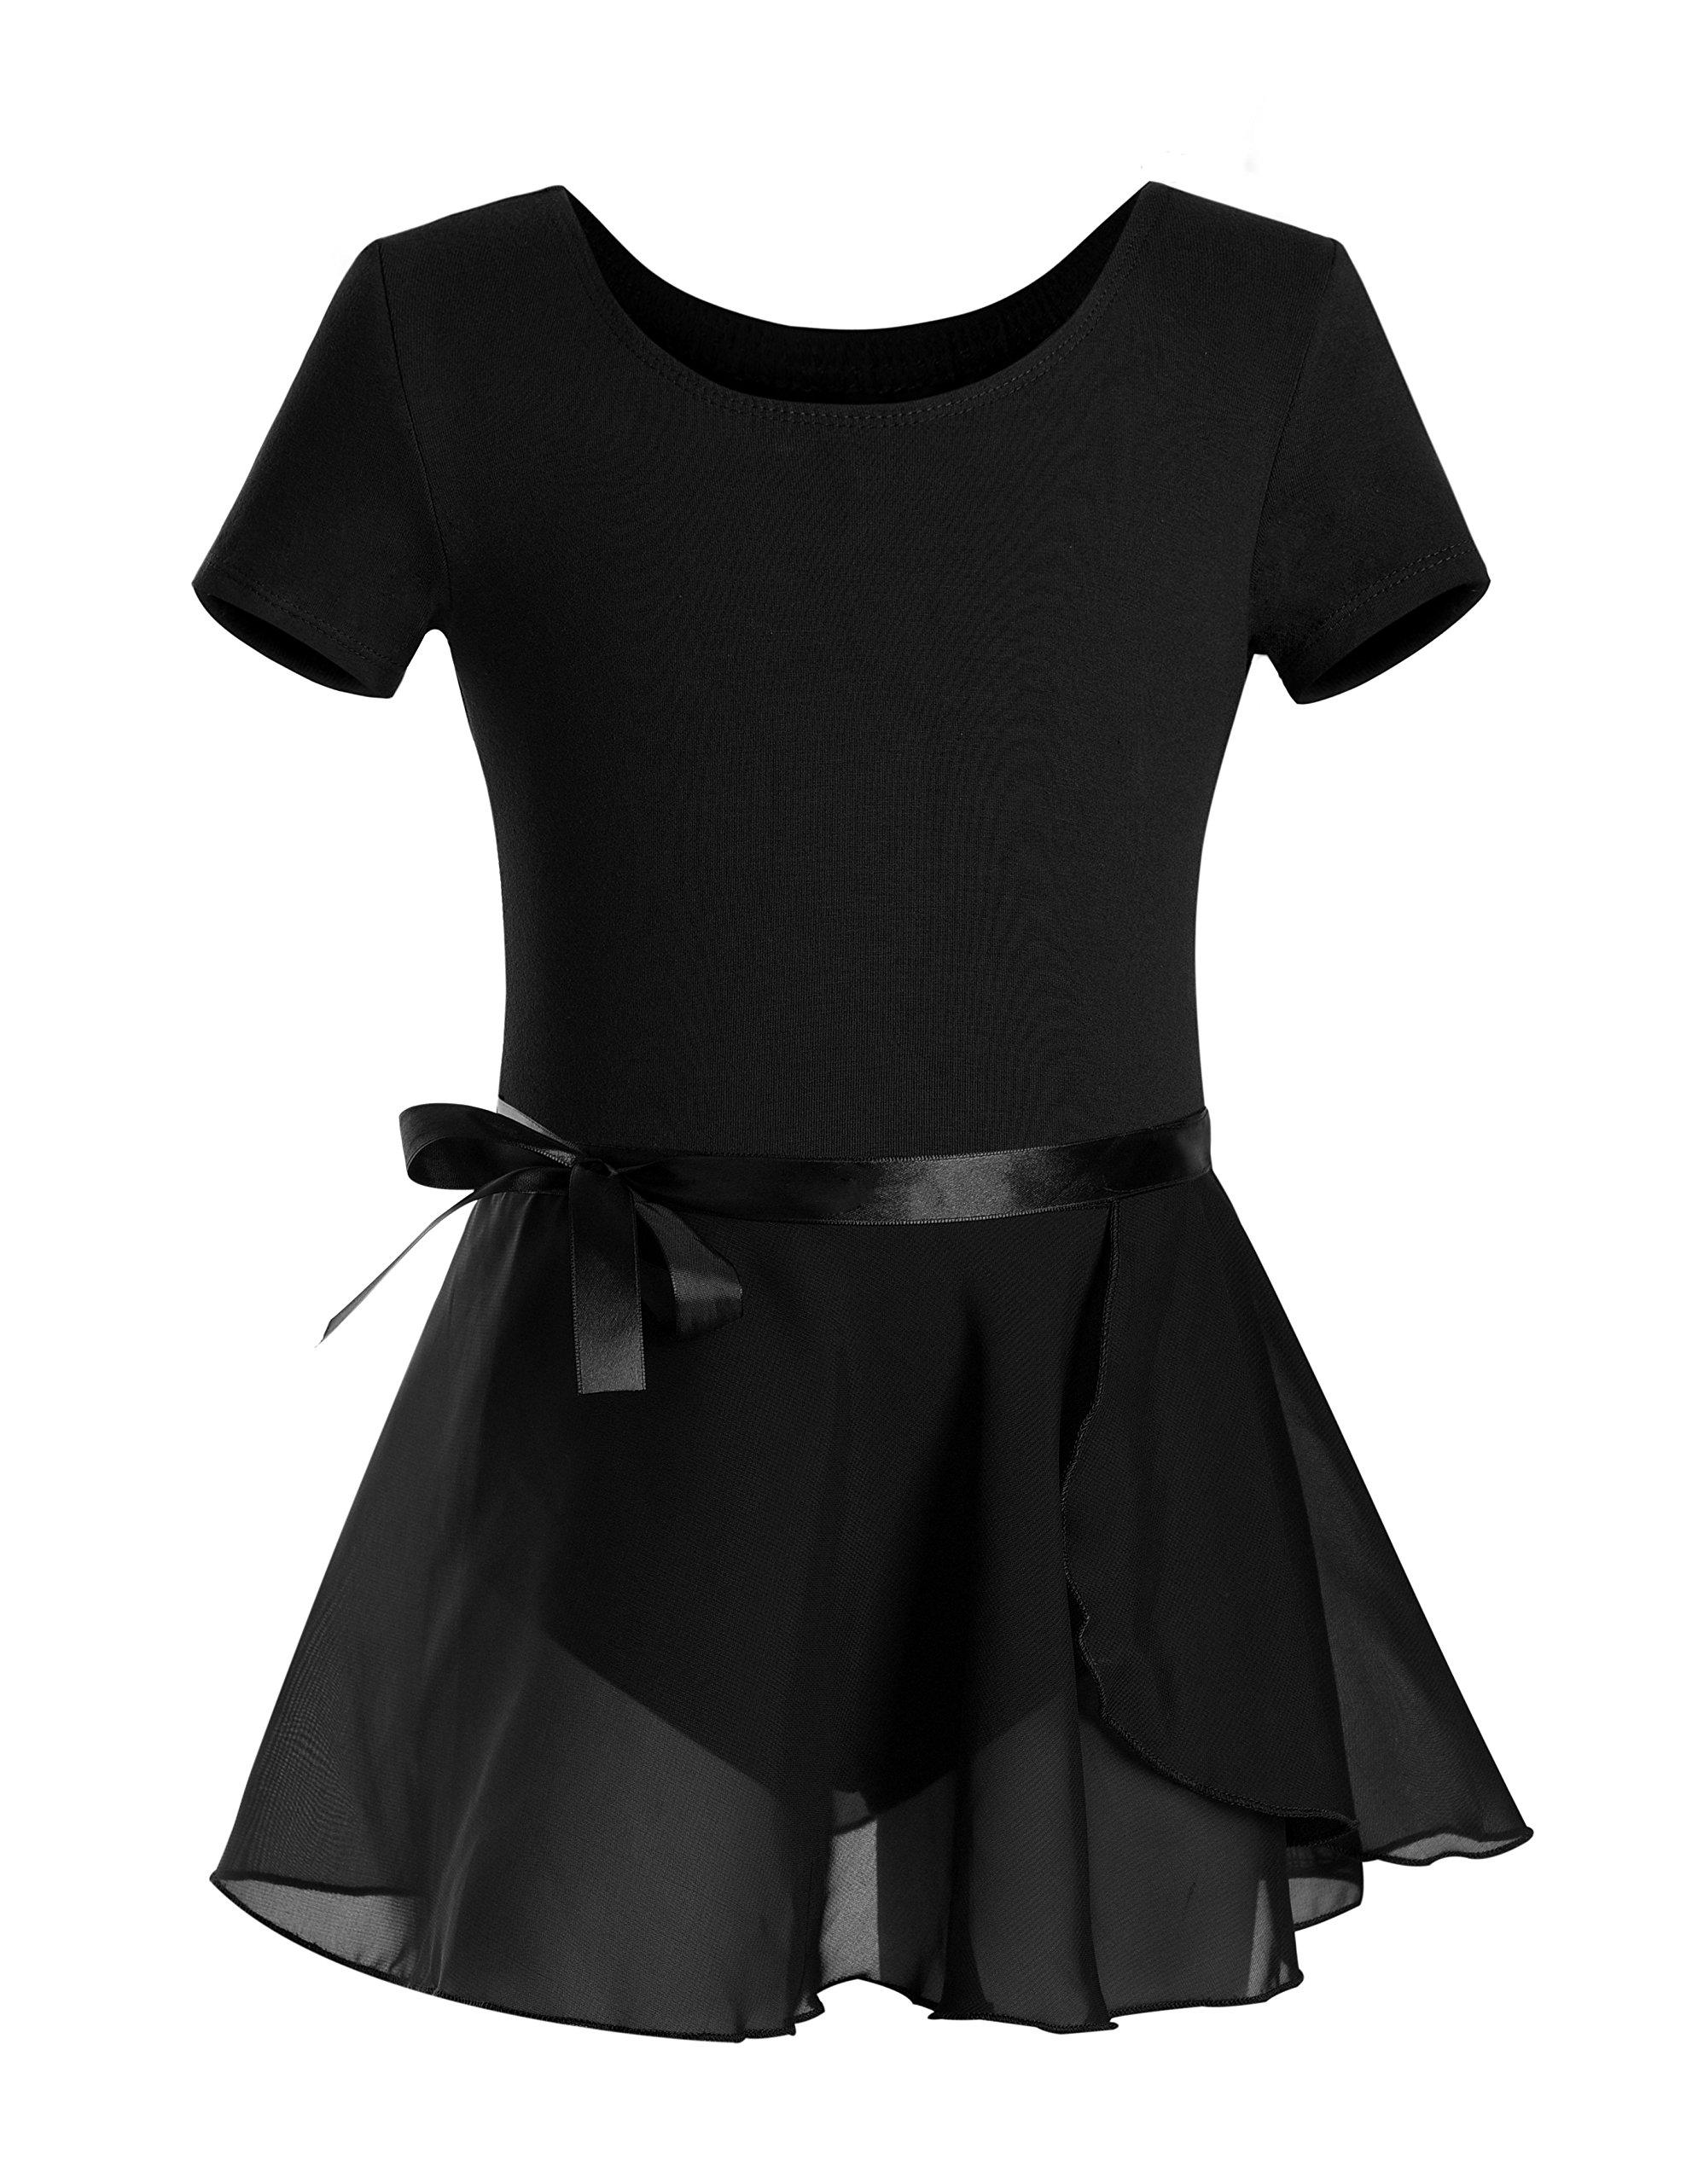 DANSHOW Girls Short Sleeve Leotard with Skirt Kids Dance Ballet Tutu Dresses(4-6,black) by DANSHOW